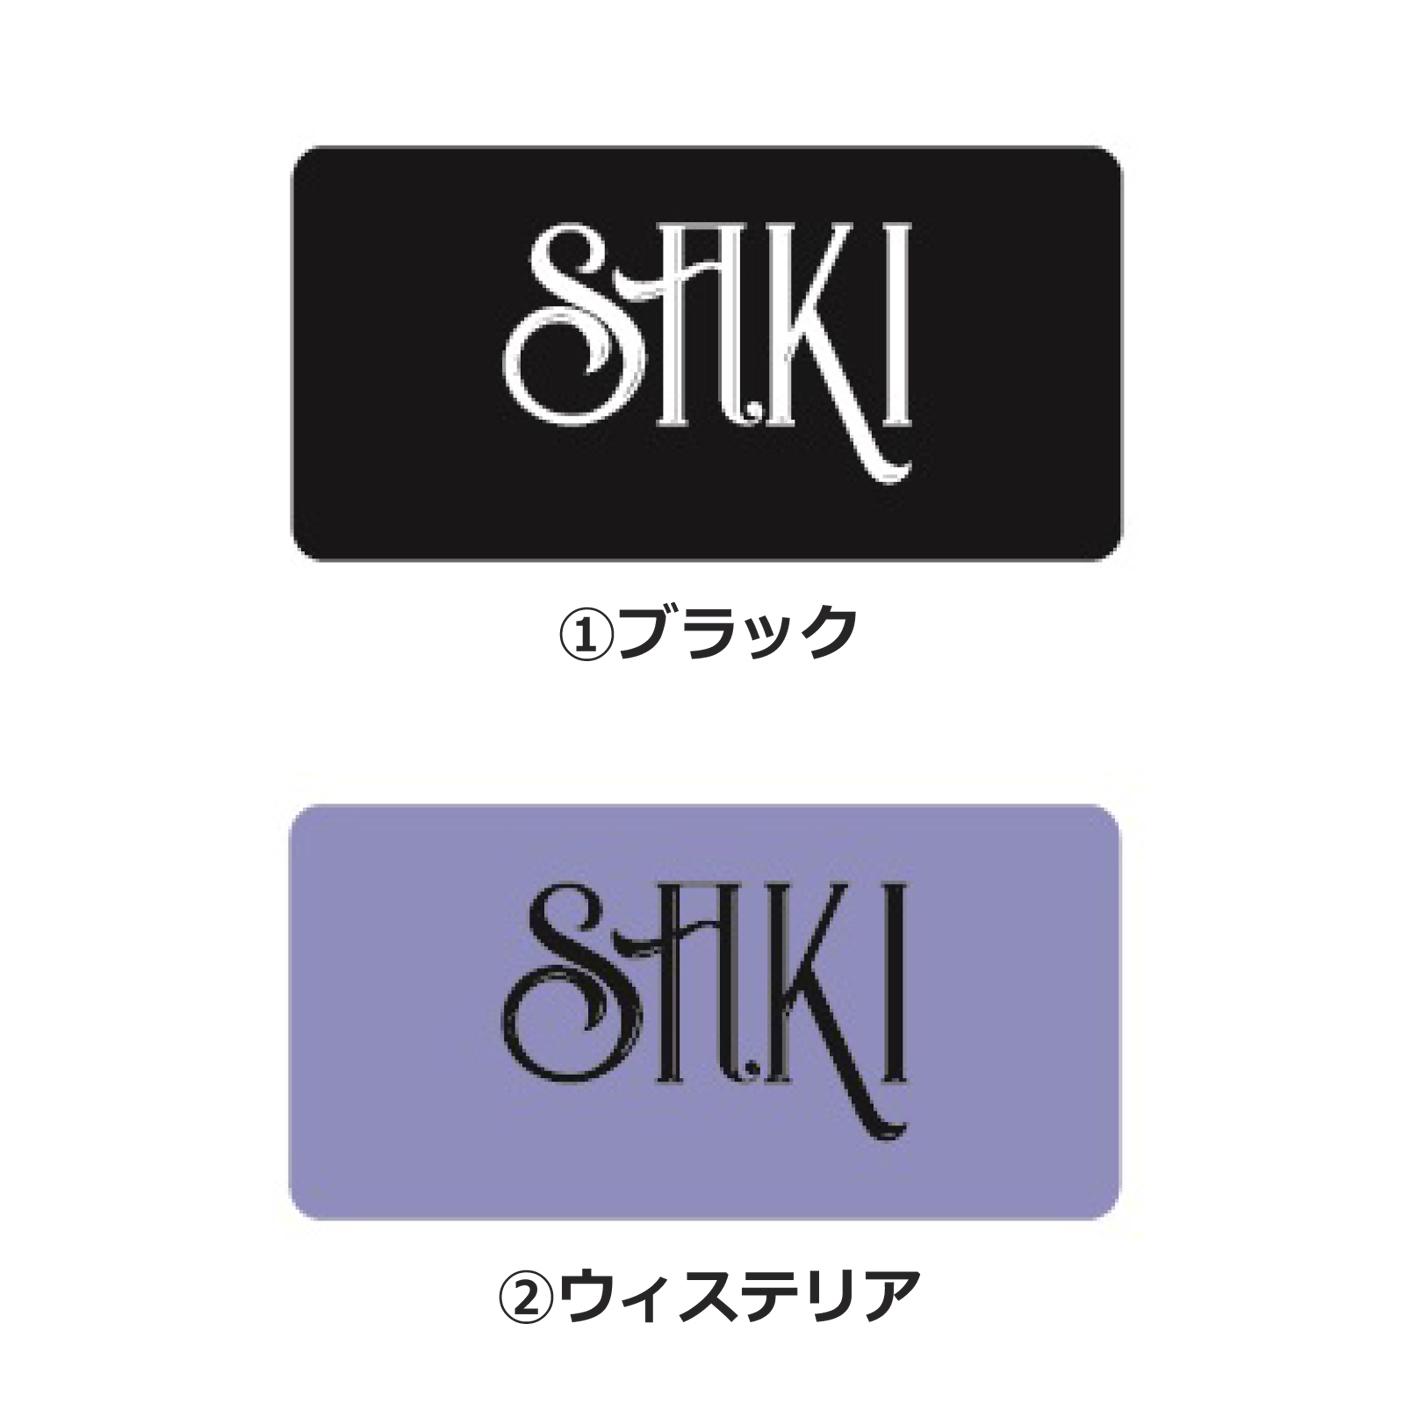 SAKI スリムリストバンド (2個セット)